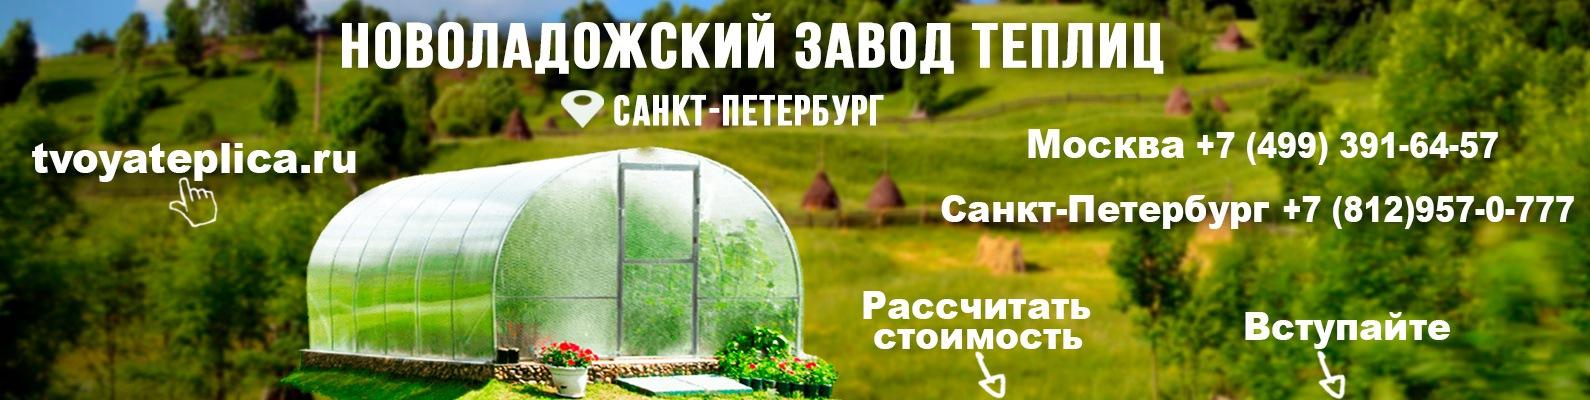 завод теплиц солнечногорск сайт